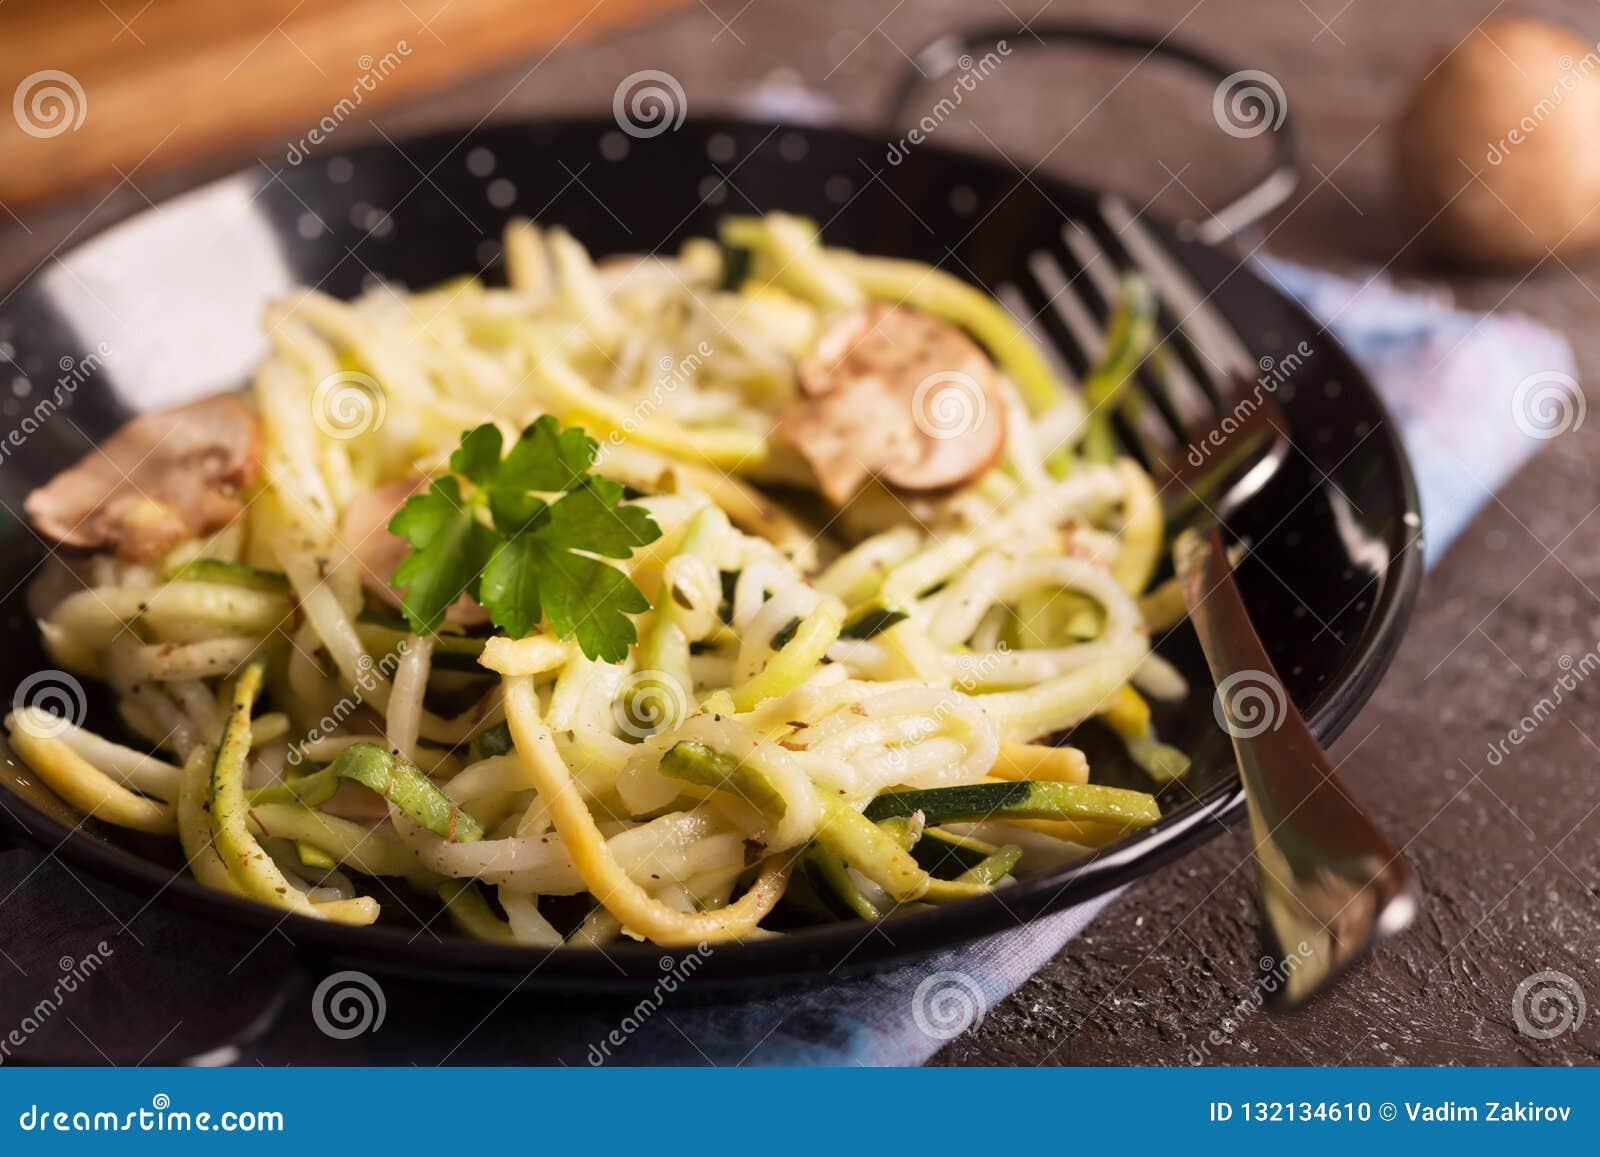 Pan van spaghetti van courgette en paddestoelsaus op houten lijst wordt voorbereid die